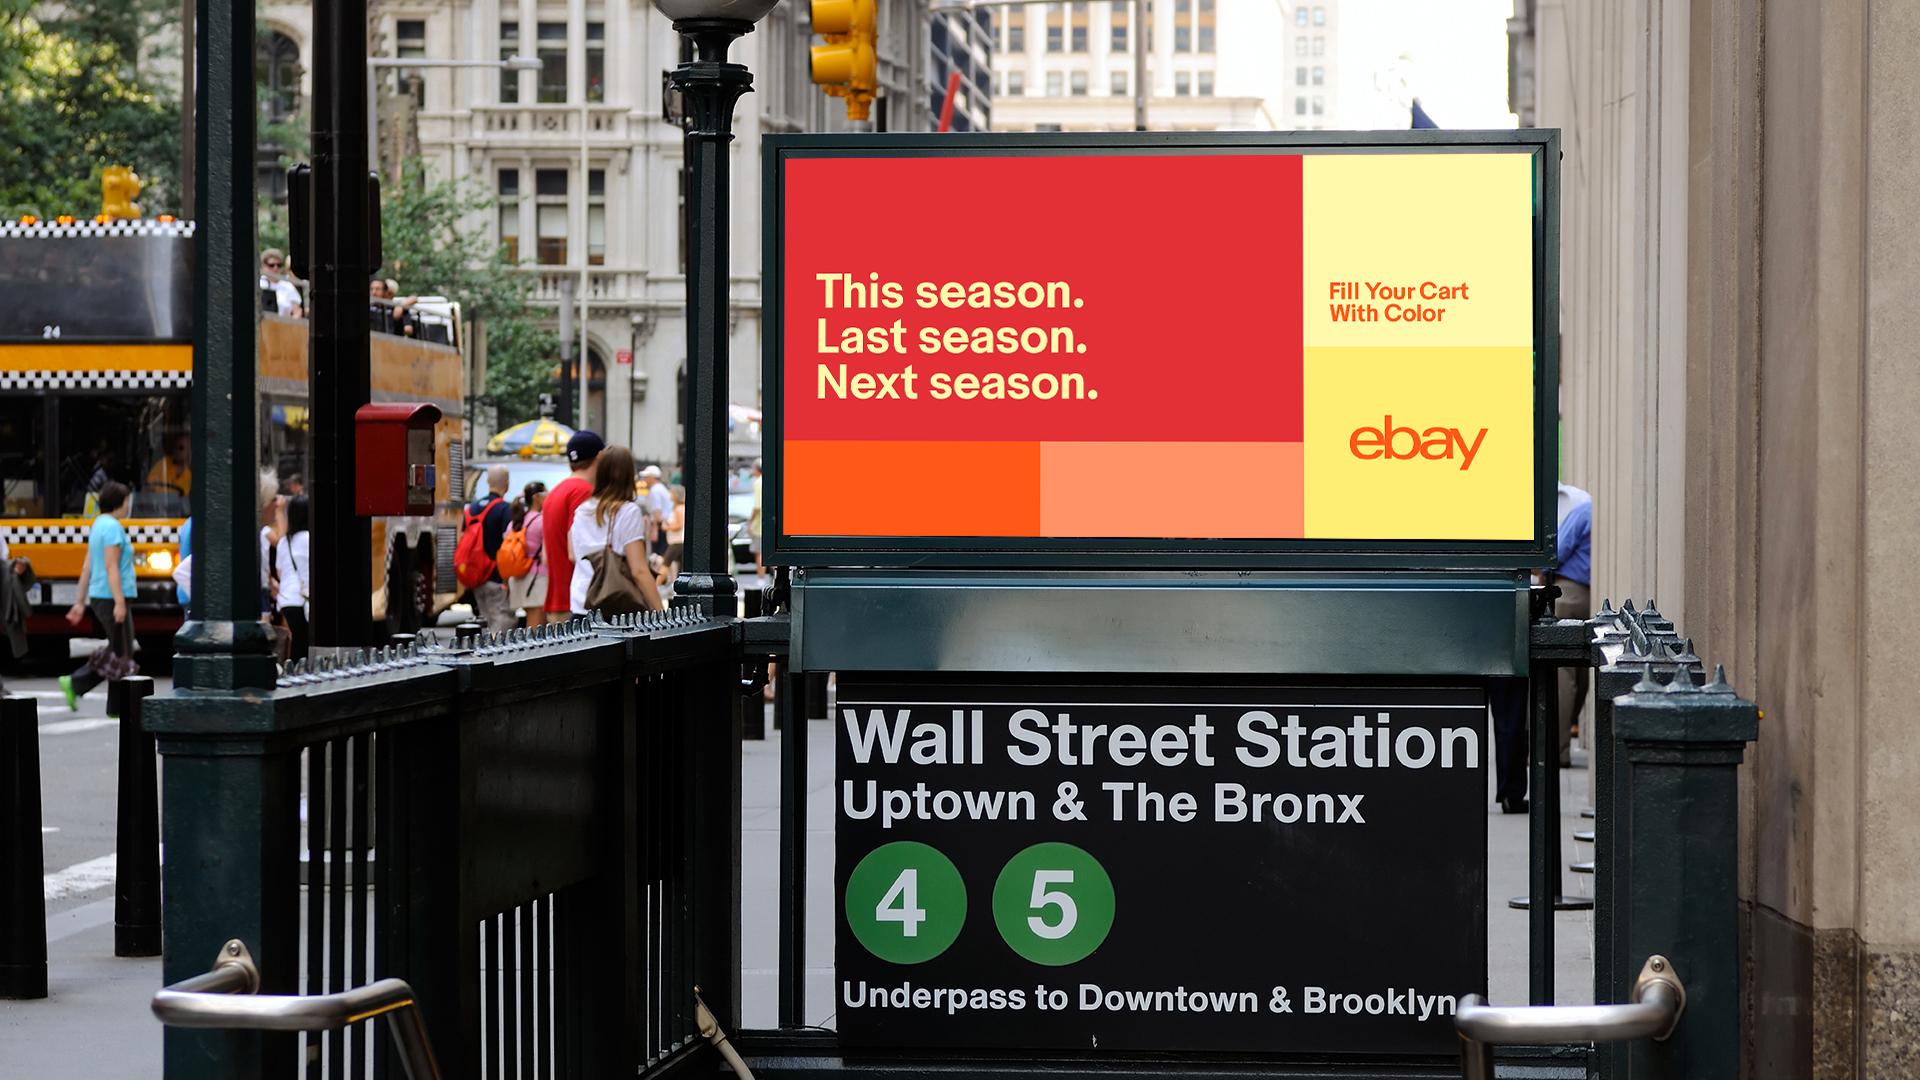 nyc_wallstreet_station_panel.jpg